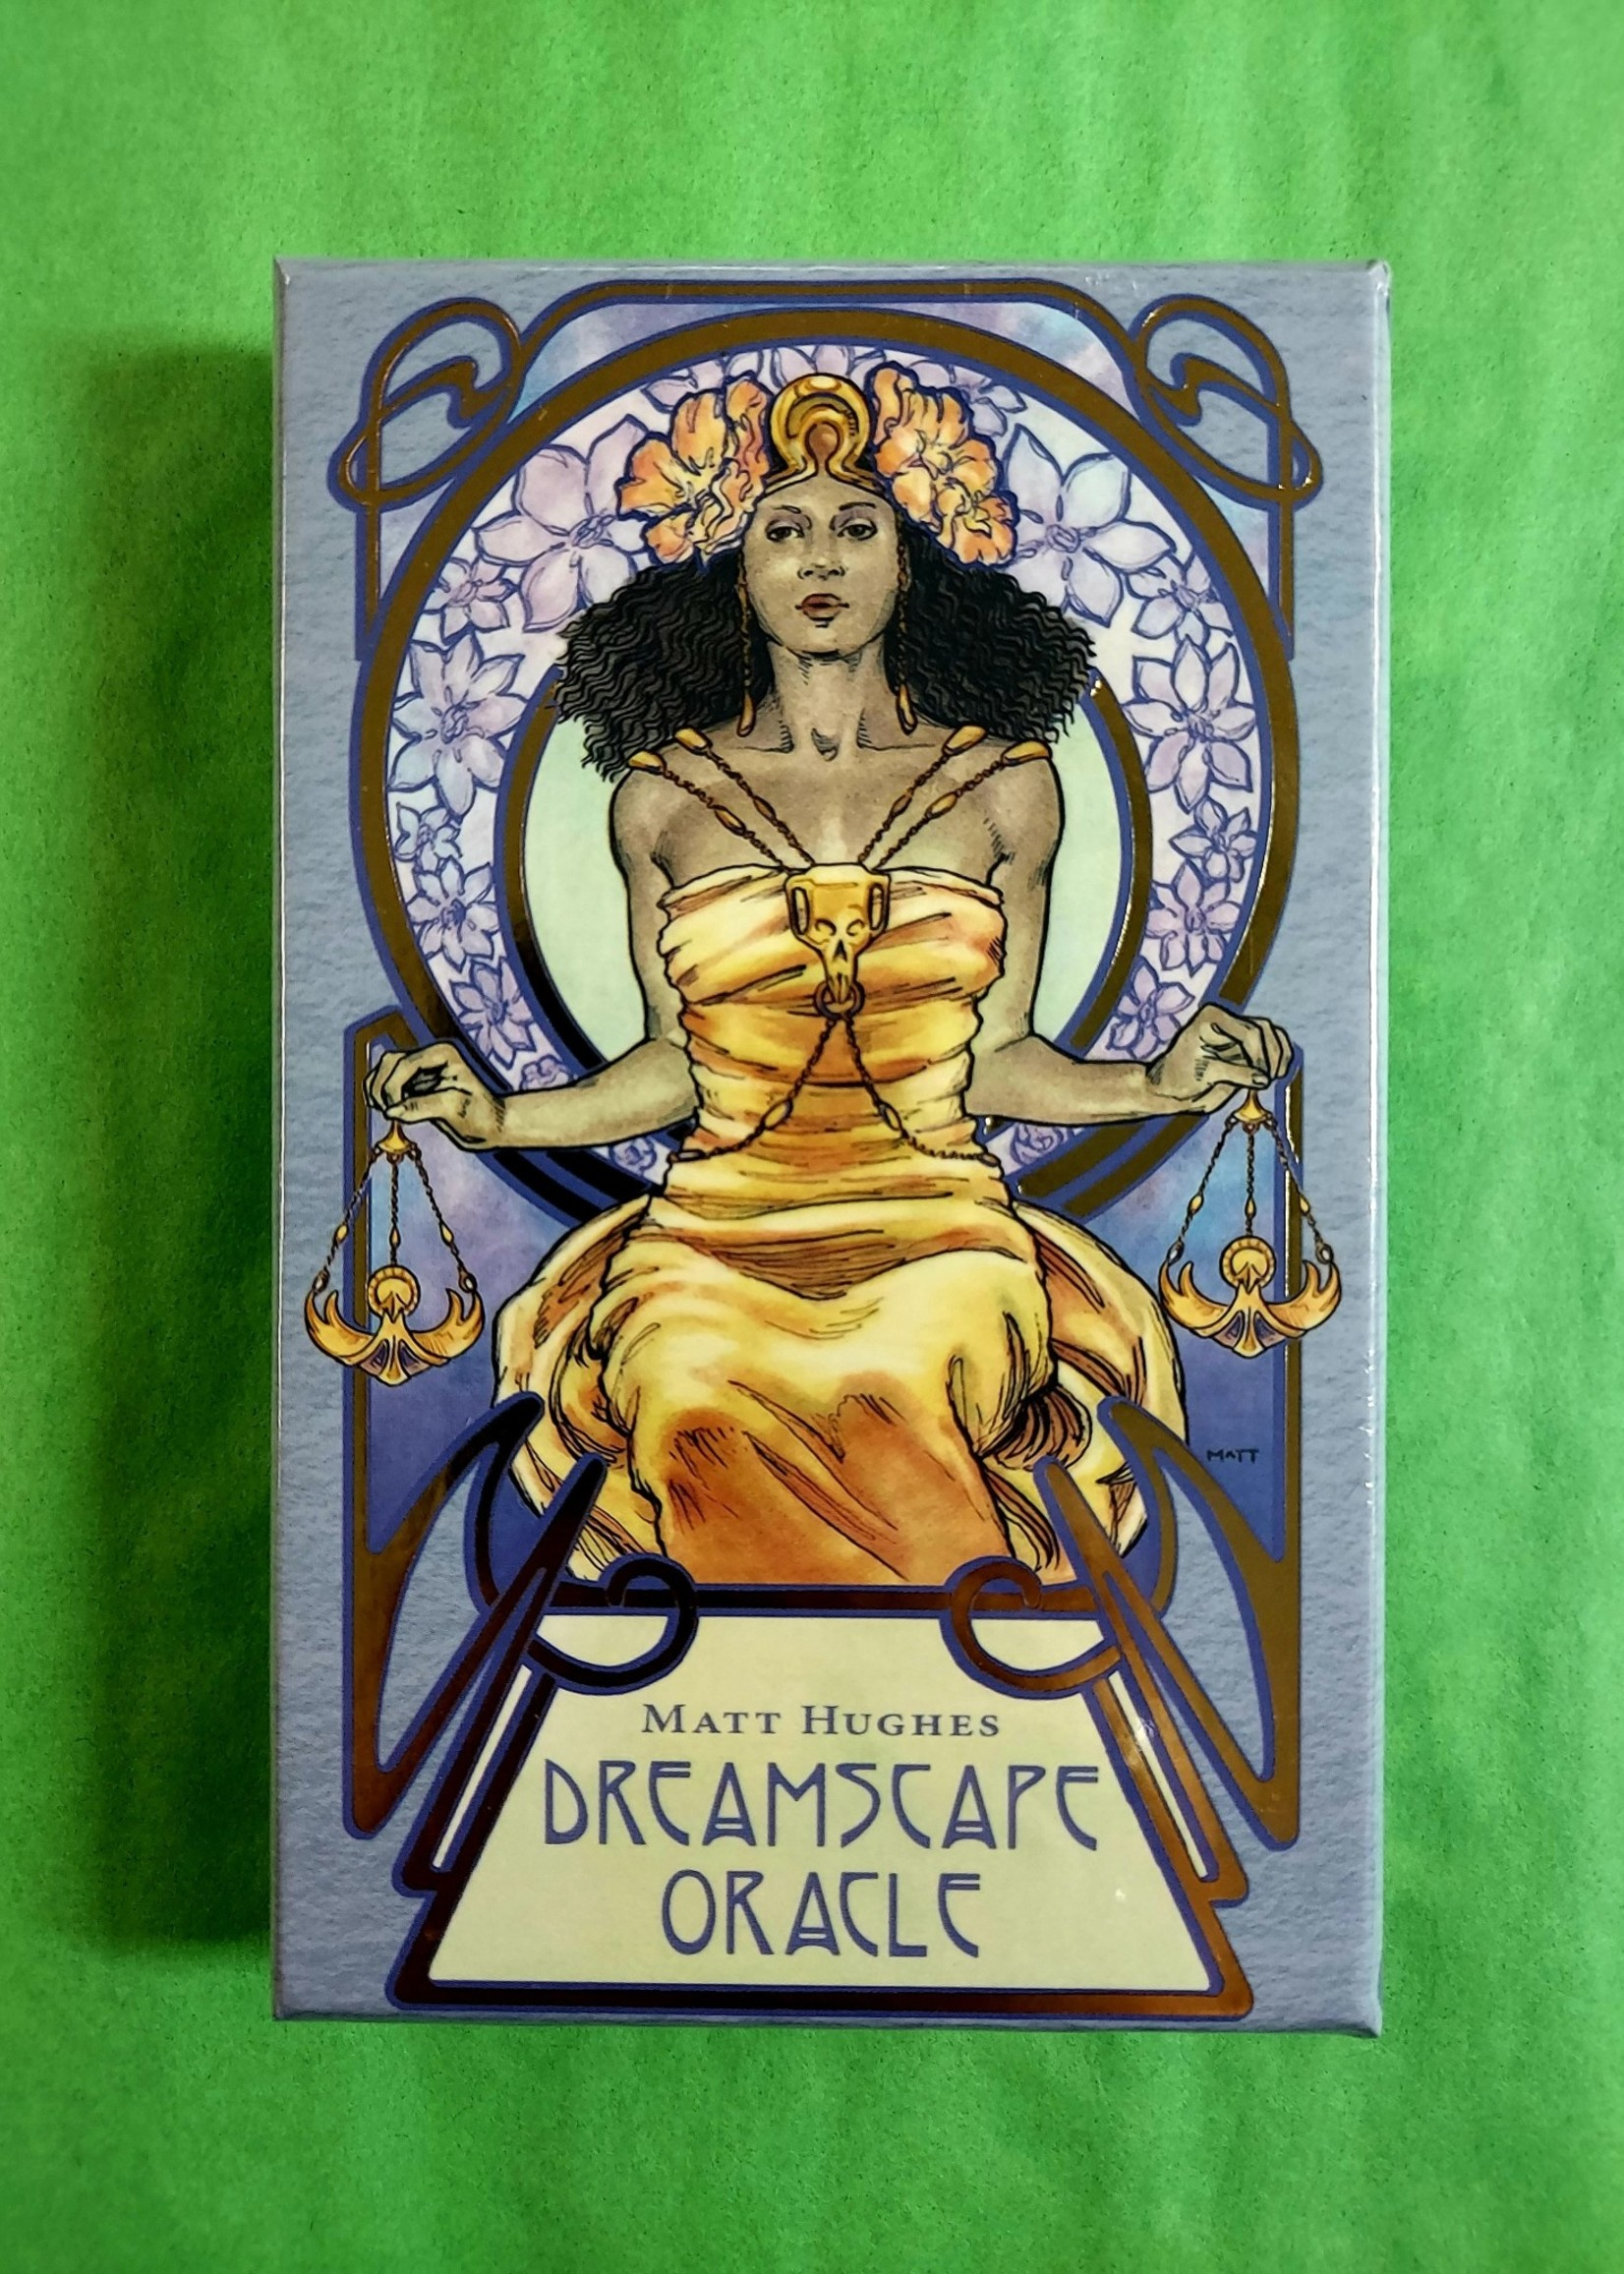 Dreamscape Oracle